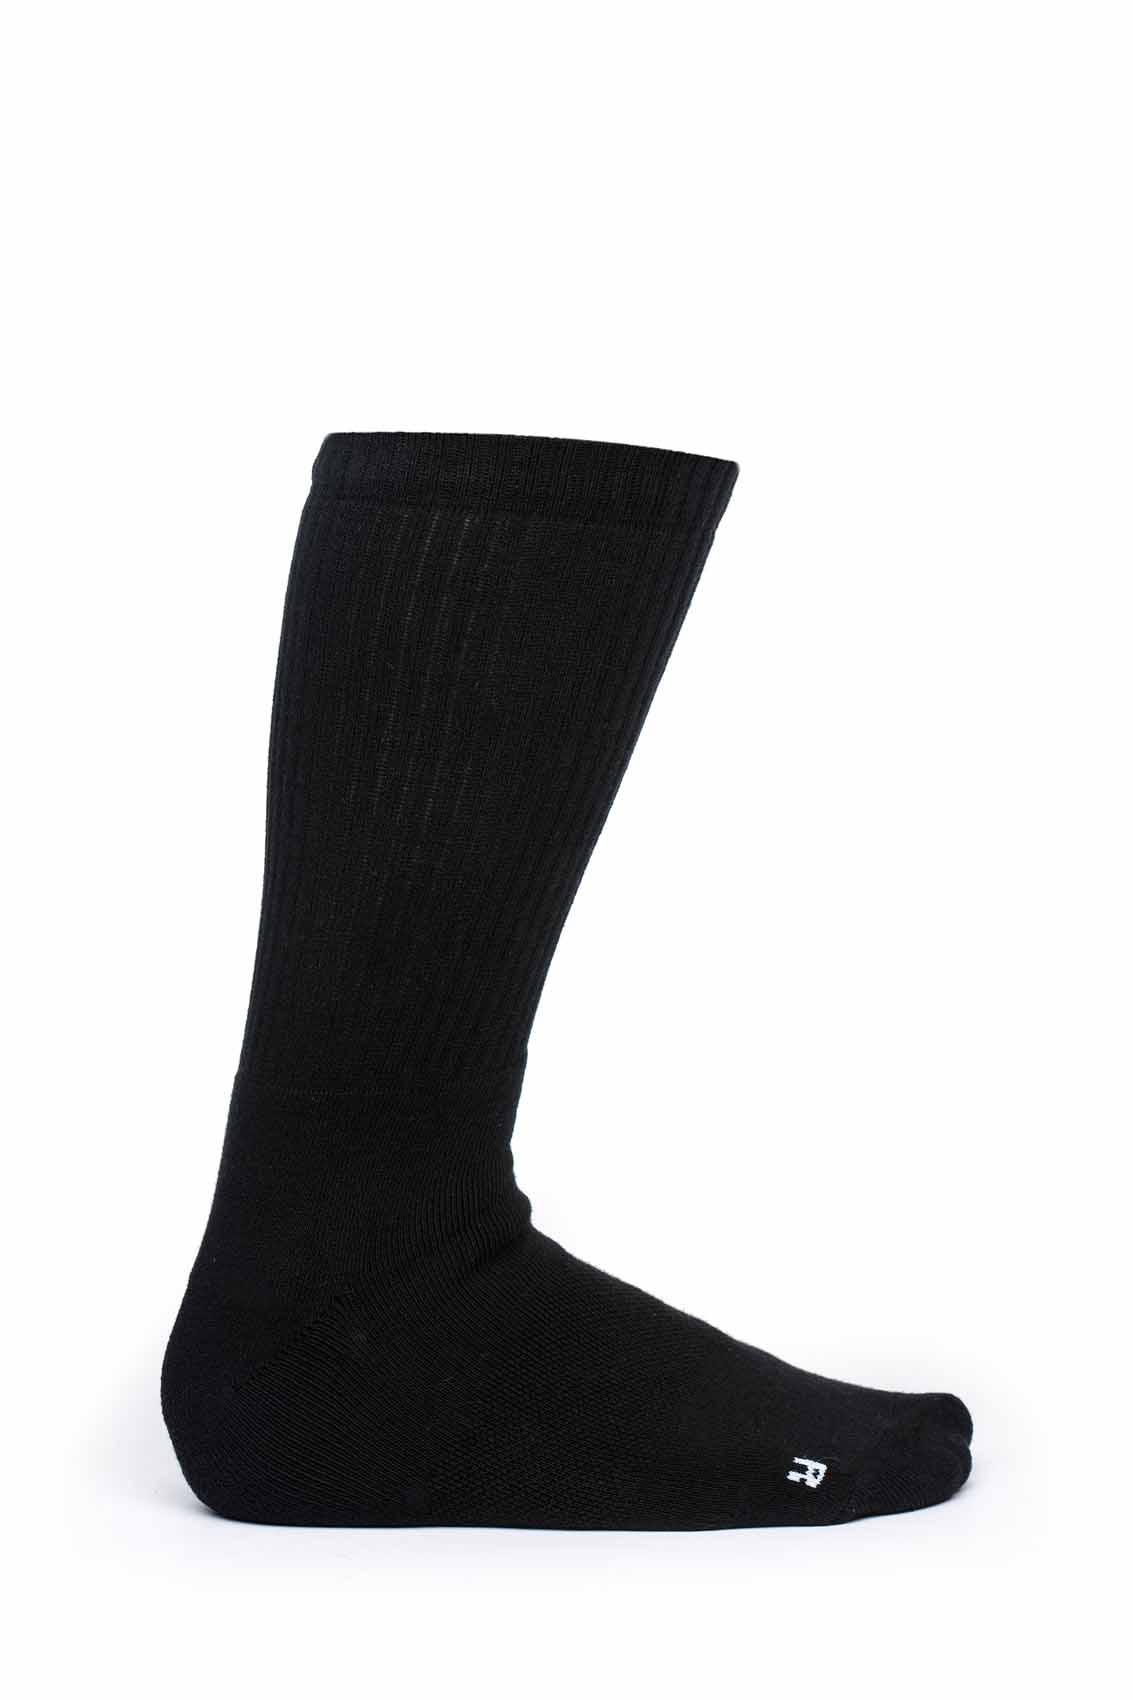 Stinky-Street-Skate-Calcetines-Todo-Negro-Aegis-antibacteriano-algodon-2018